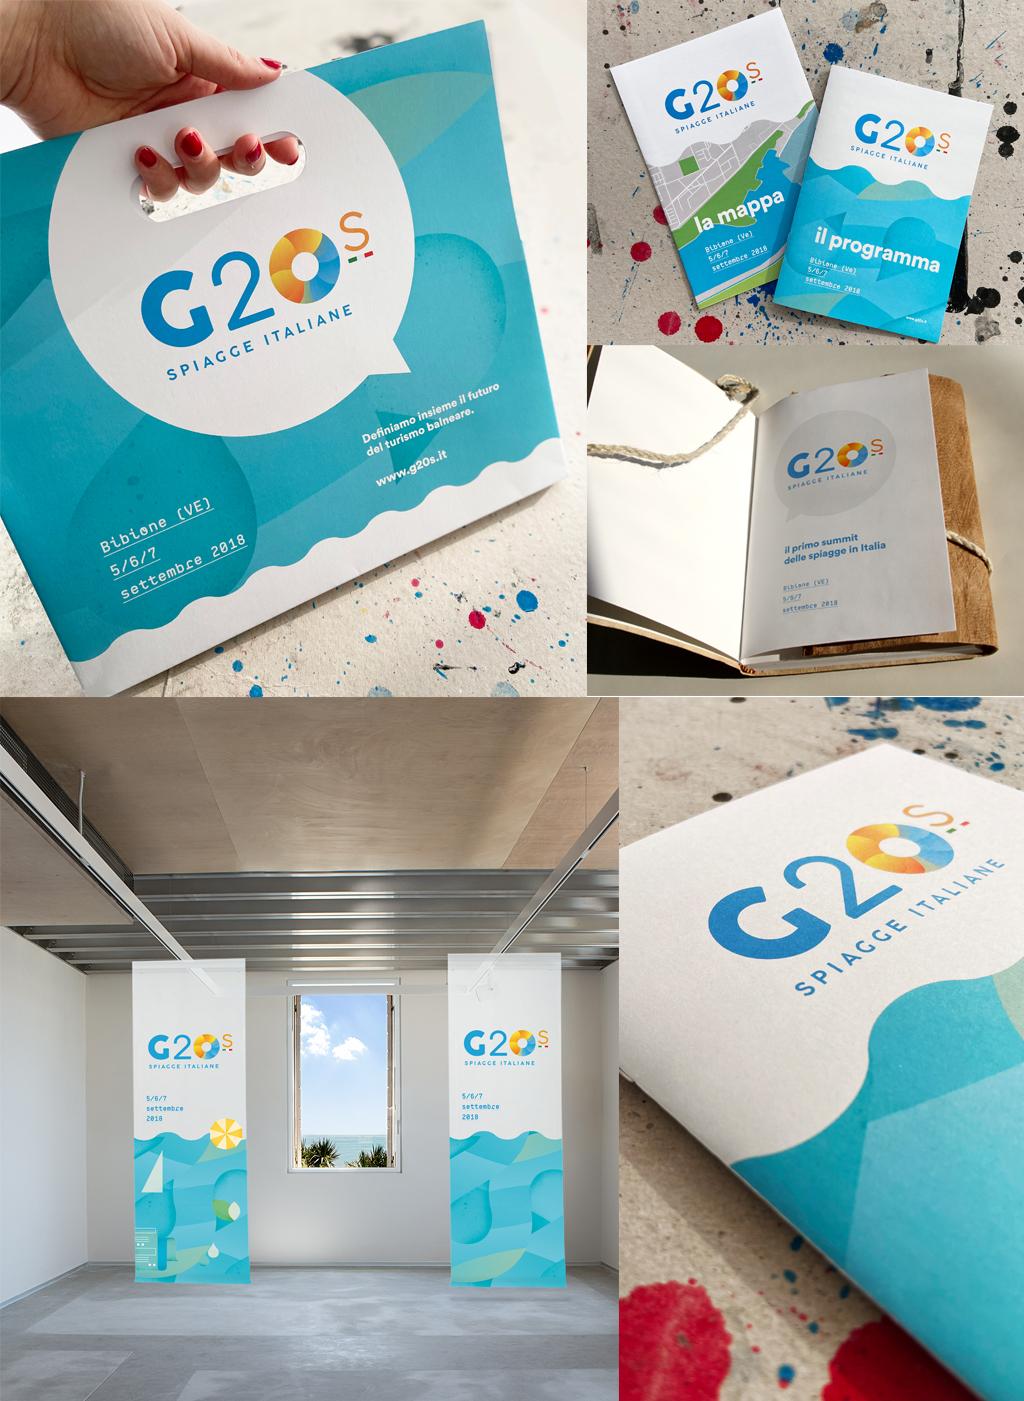 G20s-insieme-grafica 2